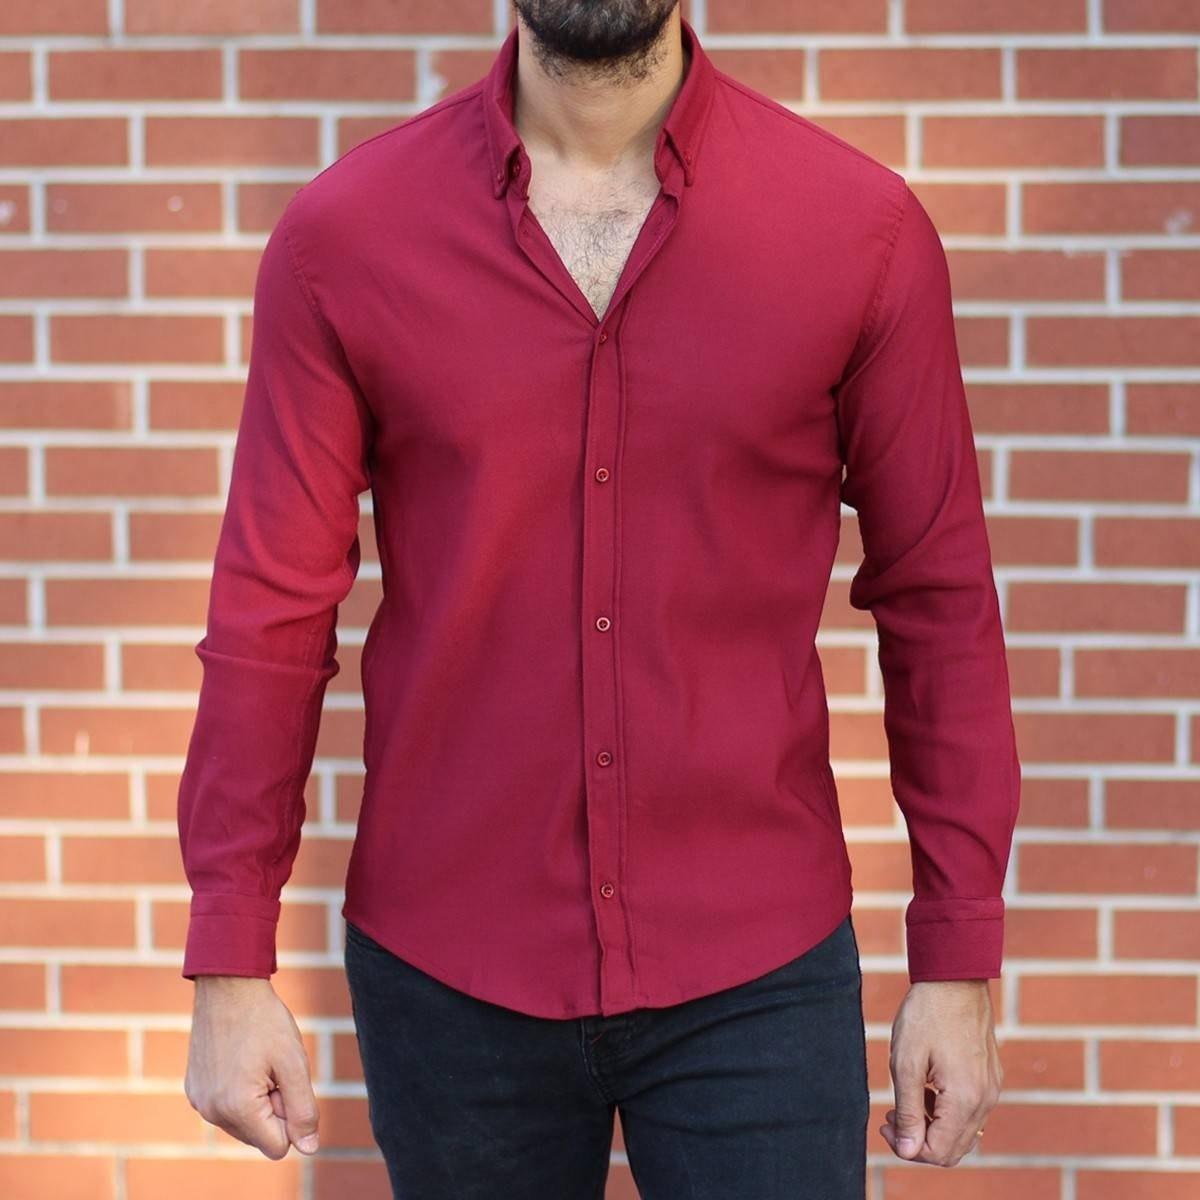 Men's Stylish Lycra Shirt In Red Mv Premium Brand - 1